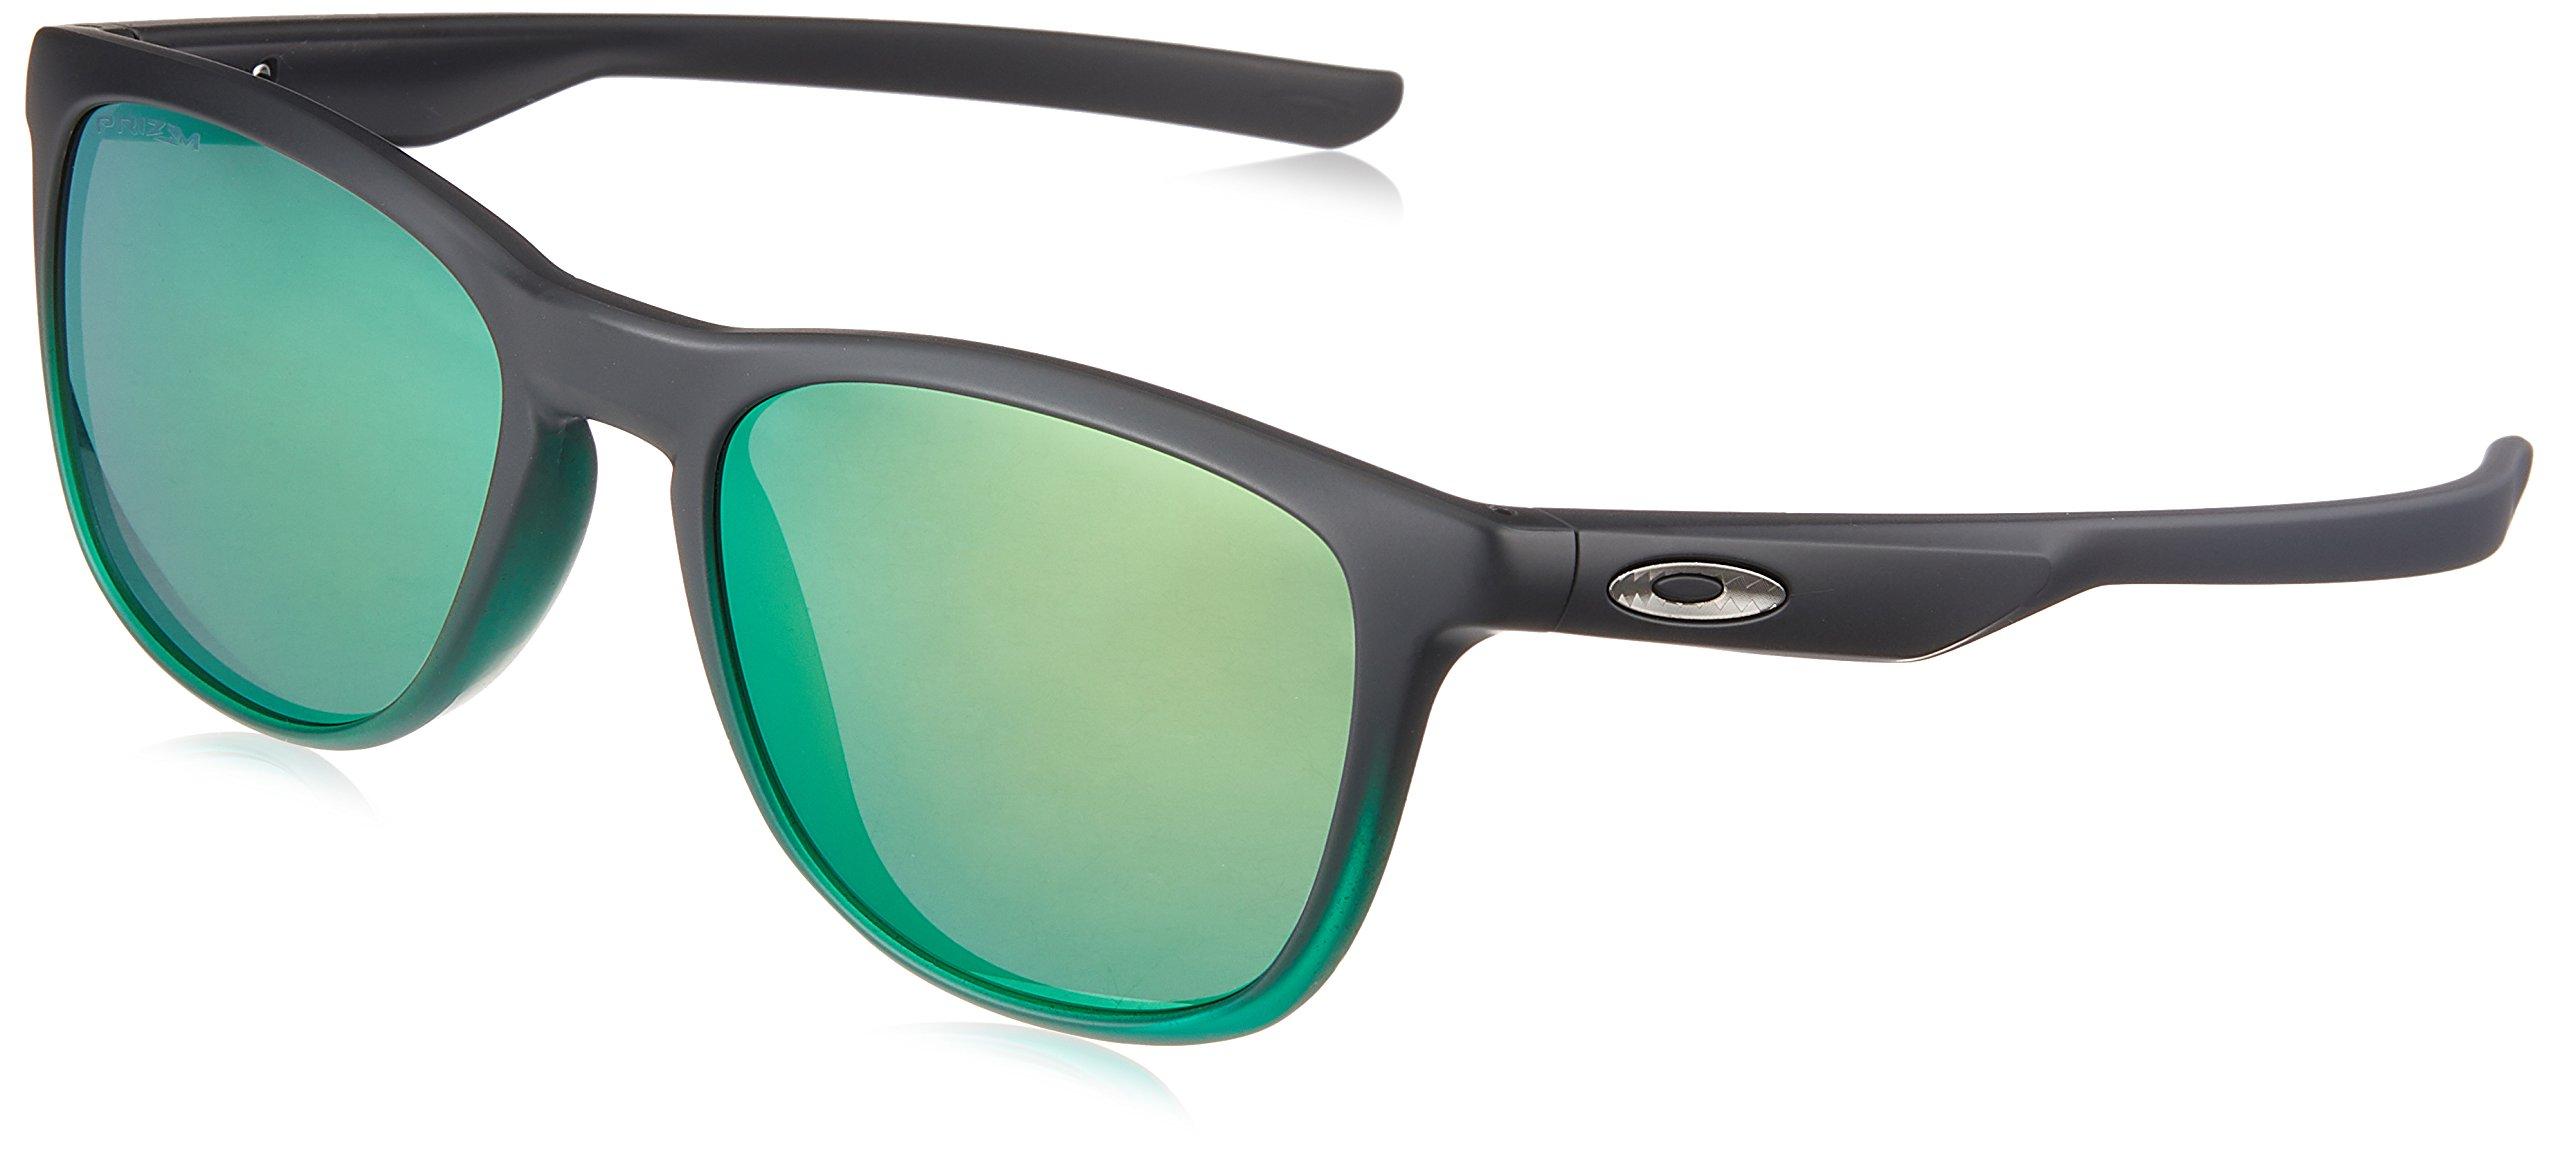 Oakley Men's Trillbe X Iridium Rectangular Sunglasses JADE FADE 52.0 mm